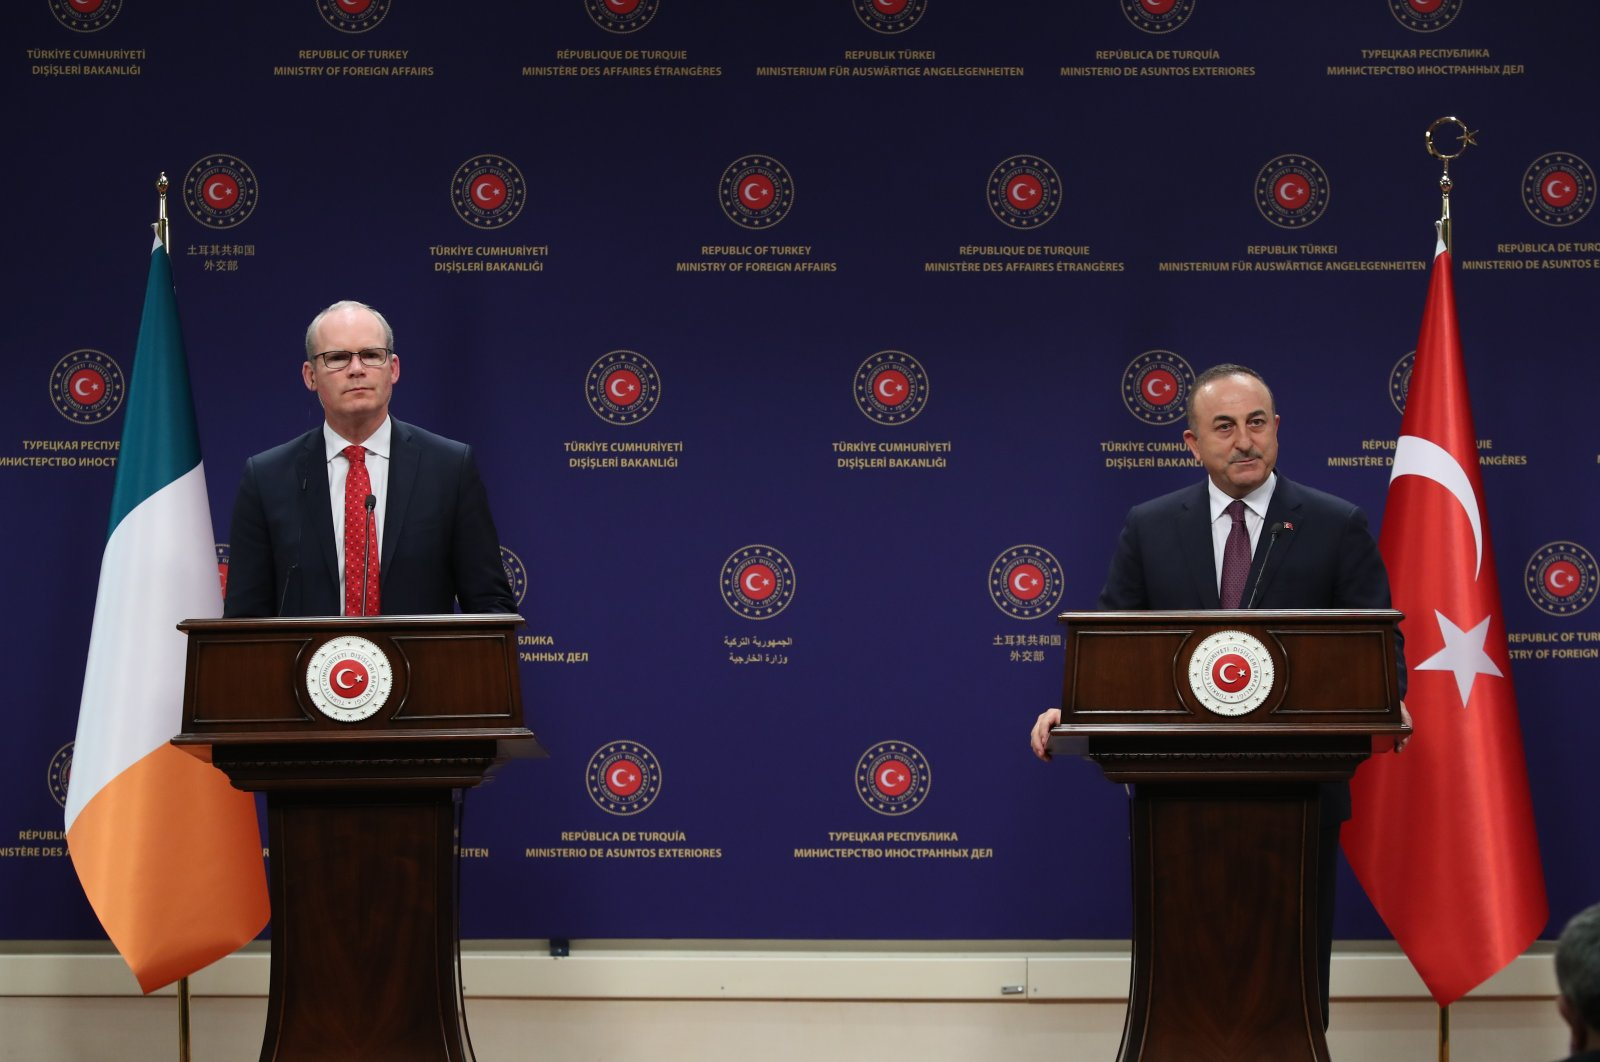 Foreign Minister MevlütÇavuşoğlu speaks at a news conference with his Irish counterpart Simon Coveney in the capital Ankara, Turkey, Jan. 27, 2020. (AA Photo)